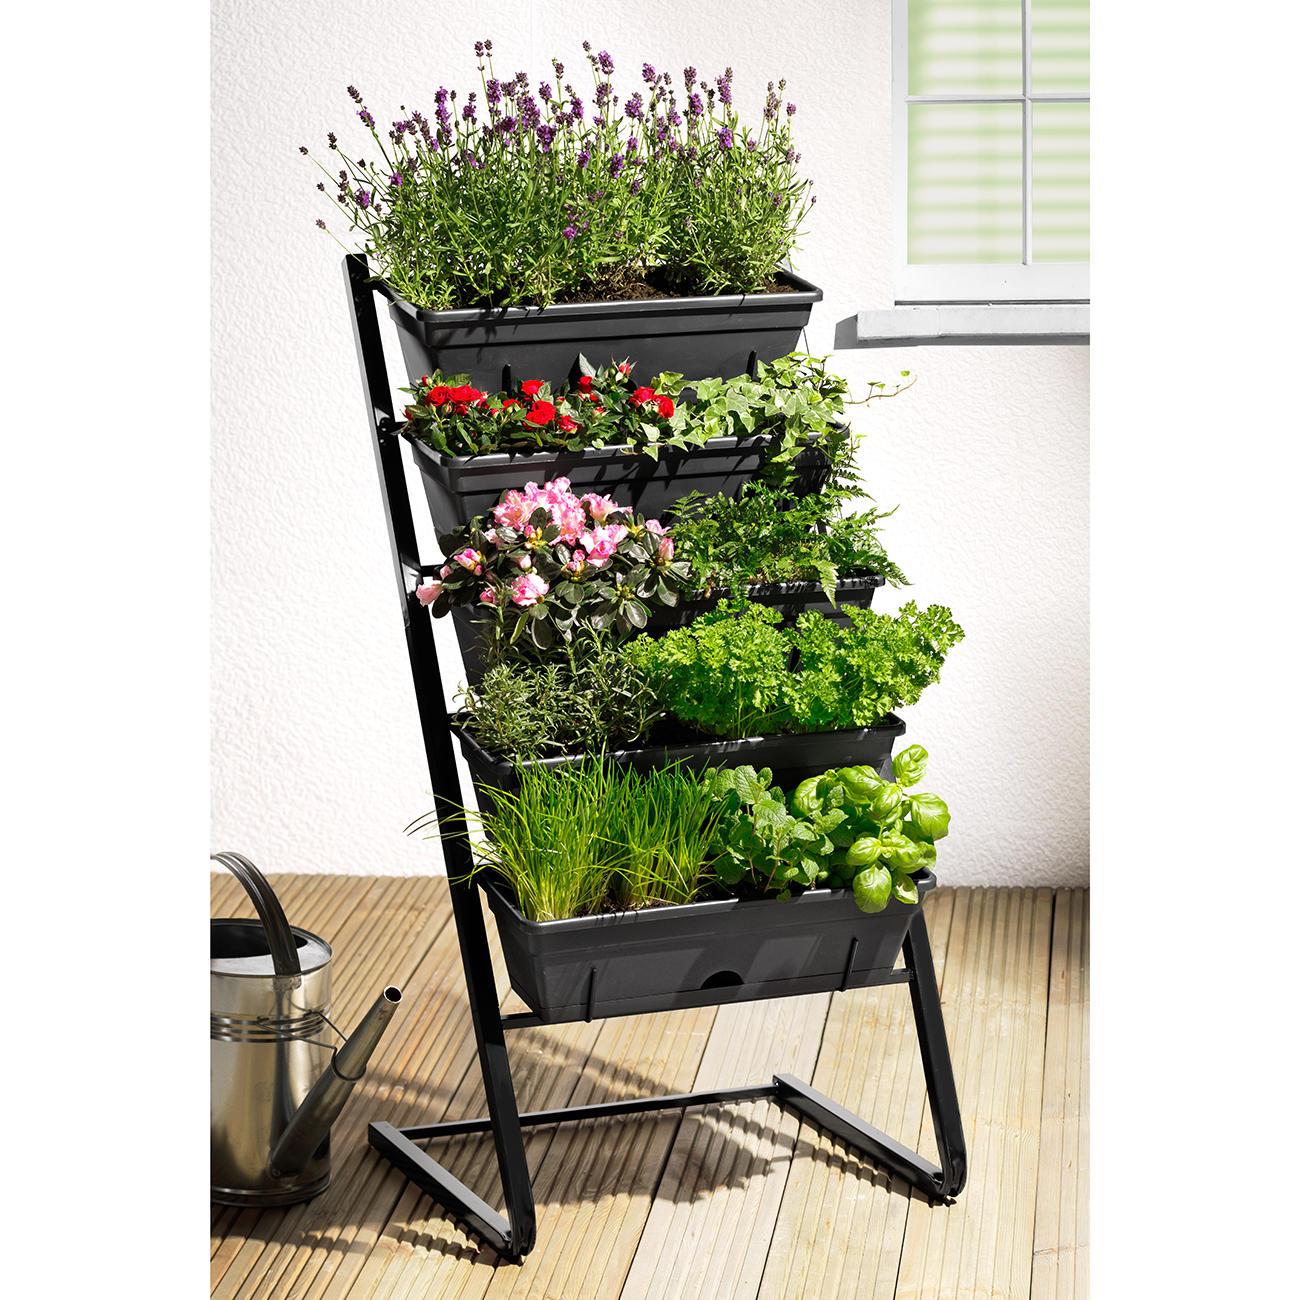 pflanztreppe 3 jahre garantie pro idee. Black Bedroom Furniture Sets. Home Design Ideas